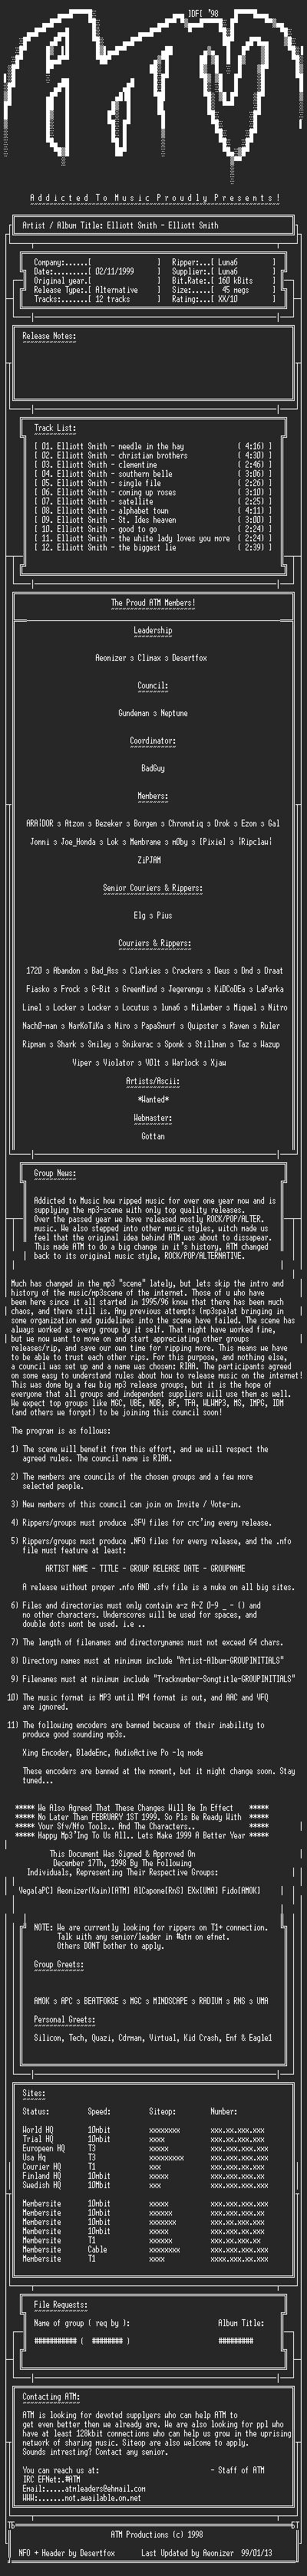 NFO file for Elliot_Smith_-_Self_Titled_-_(1994)_-_ATM